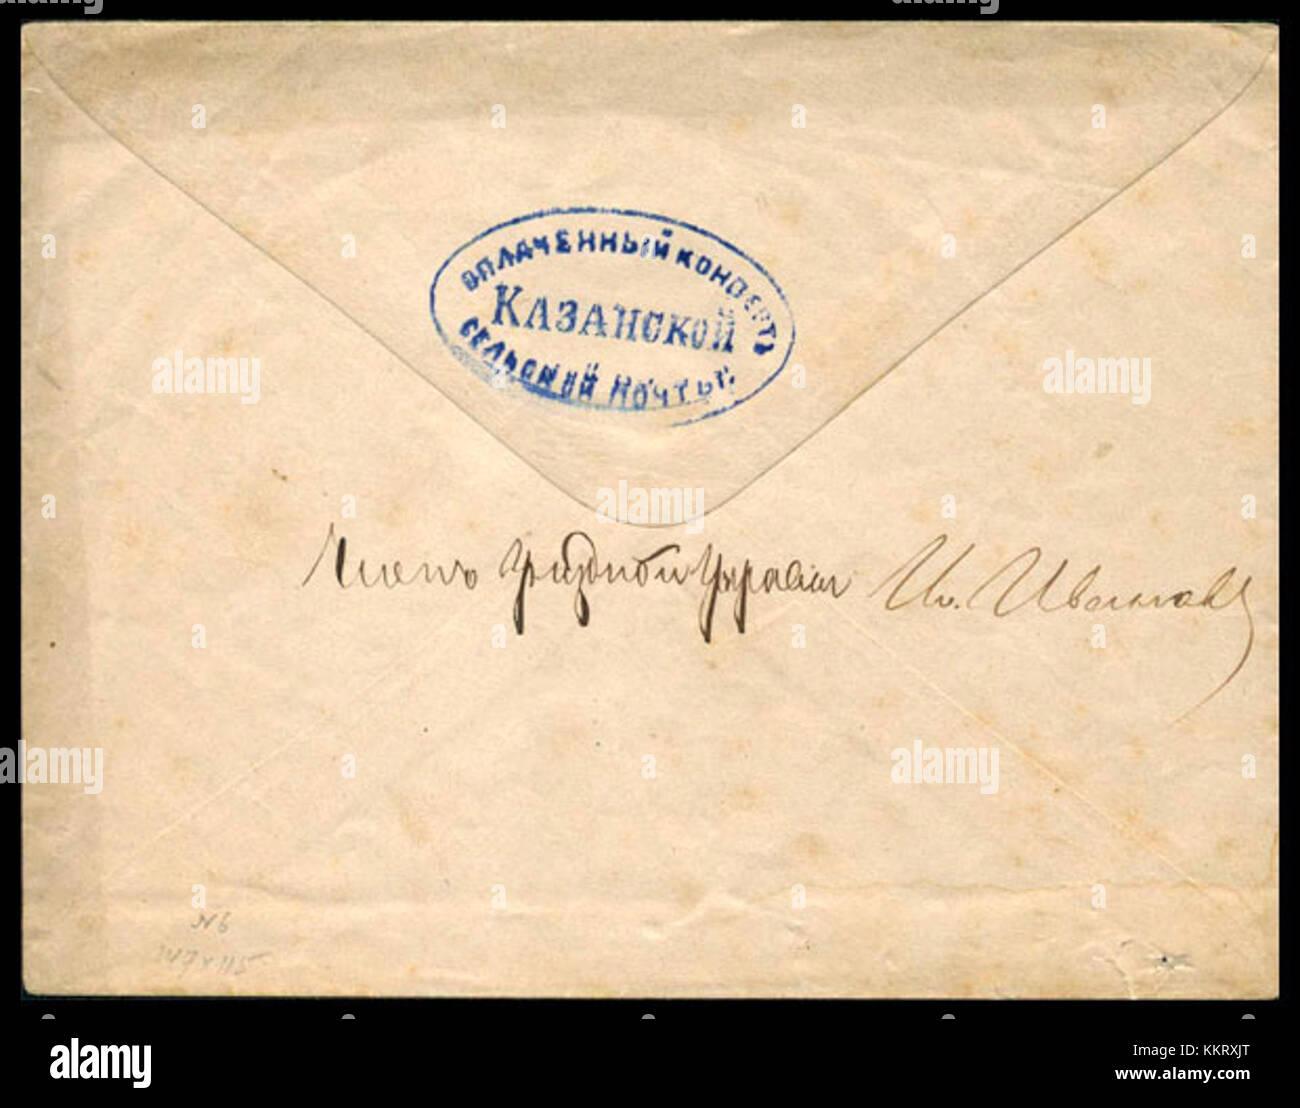 Russian stempel envelope Kazan Uyezd - Stock Image